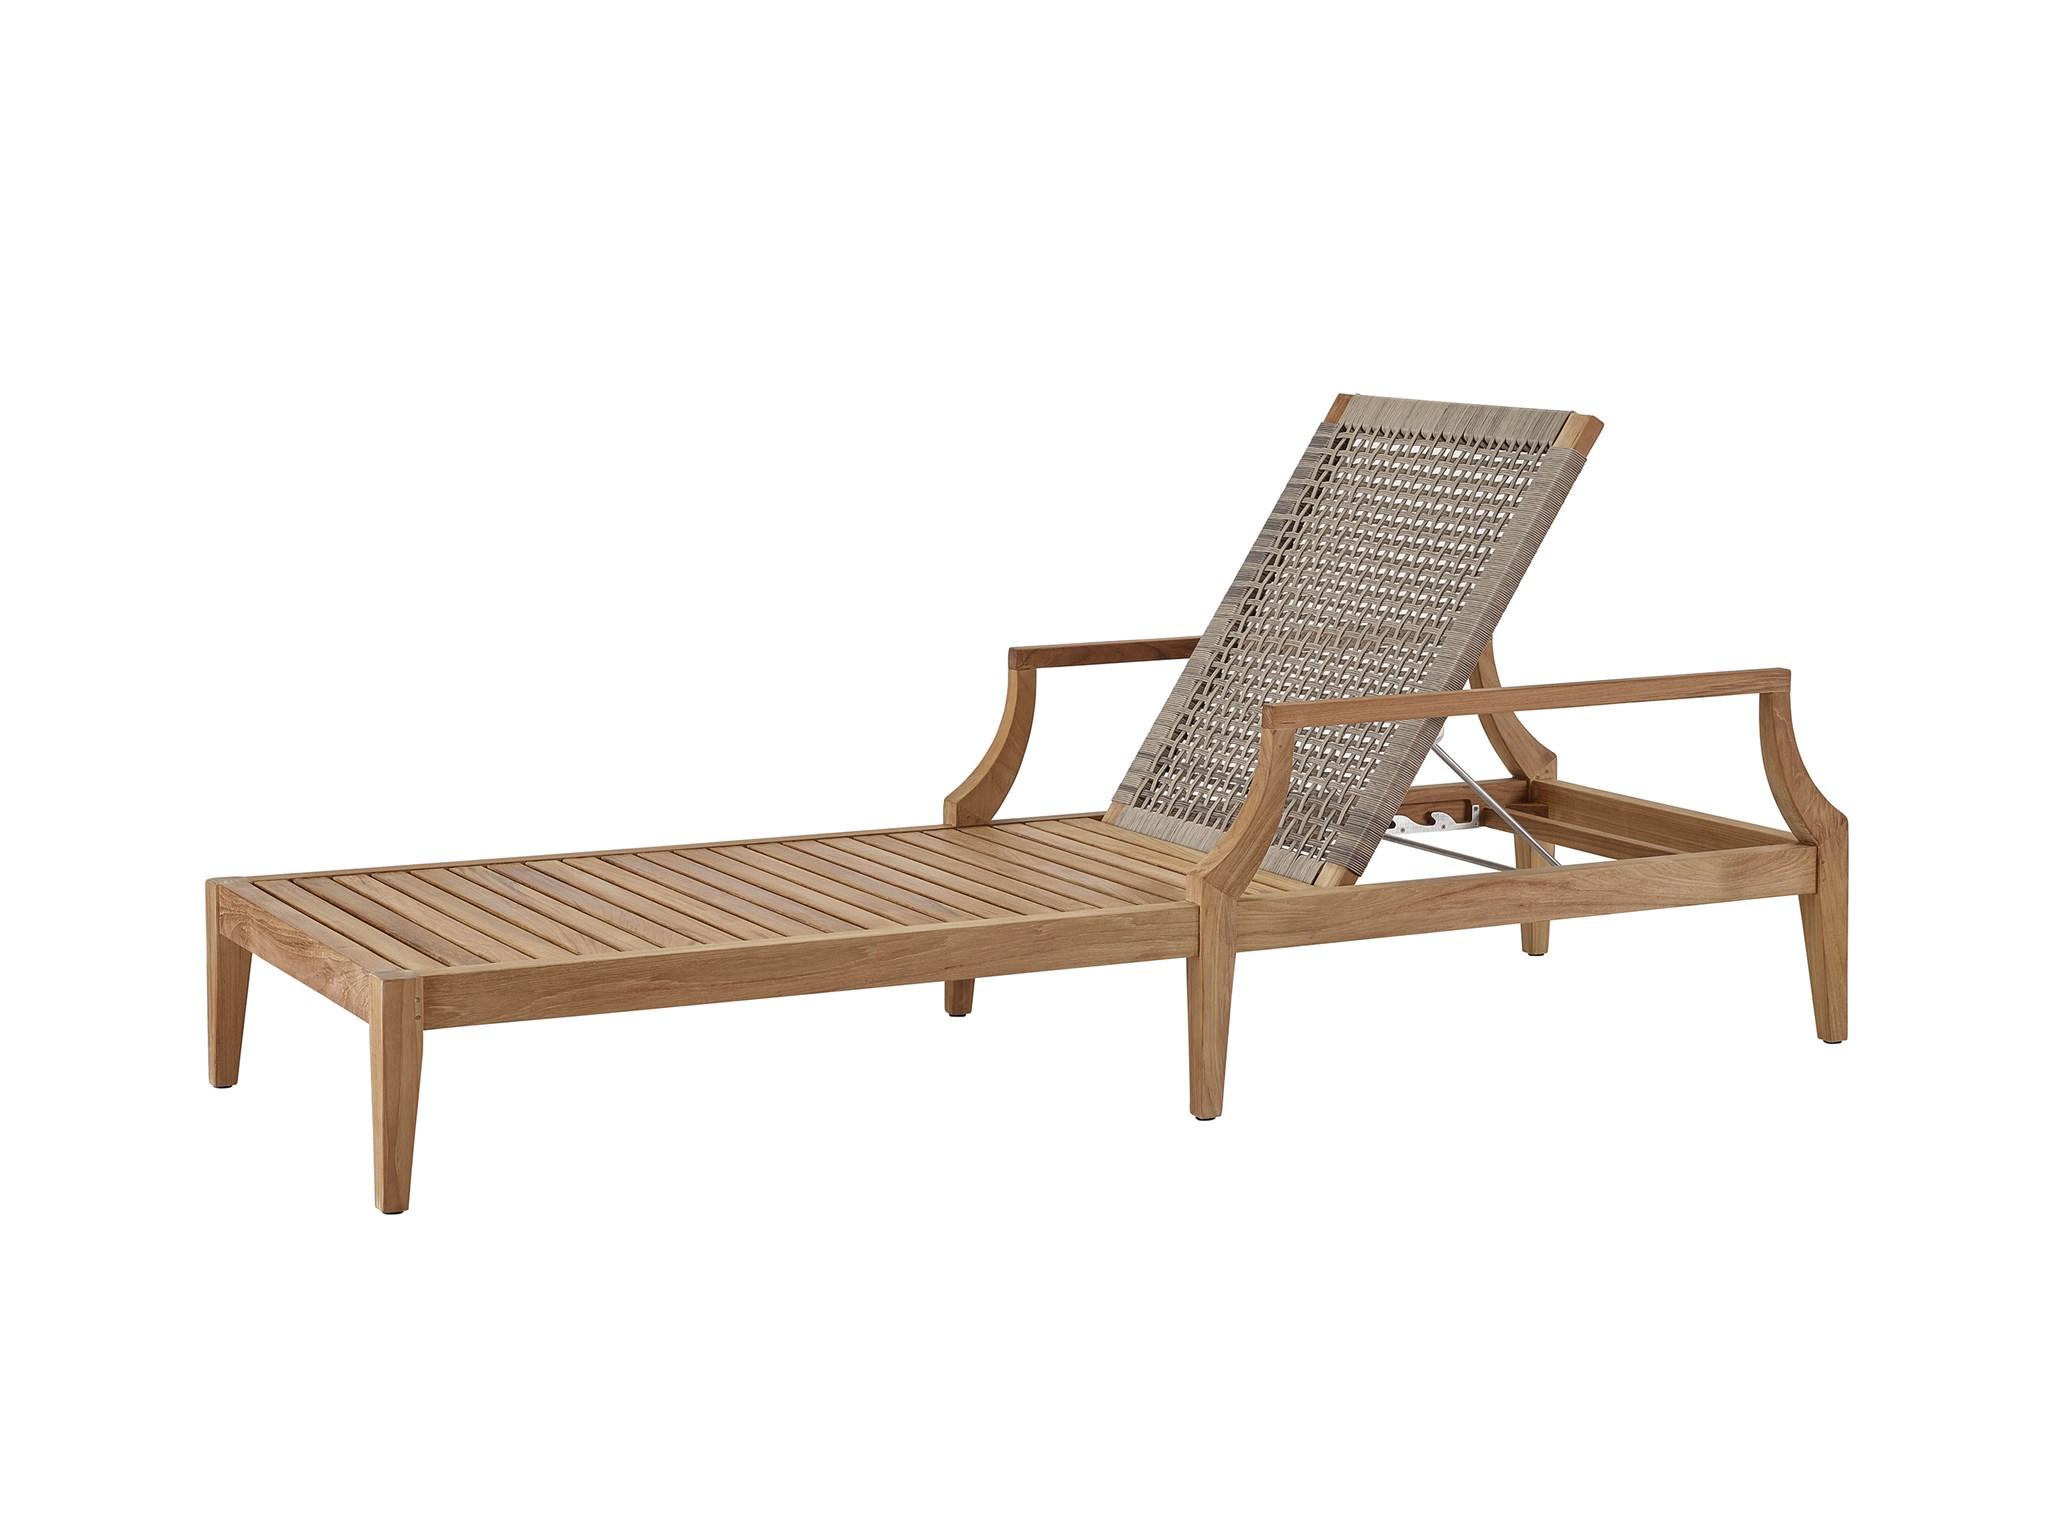 Chesapeake Chaise Lounge